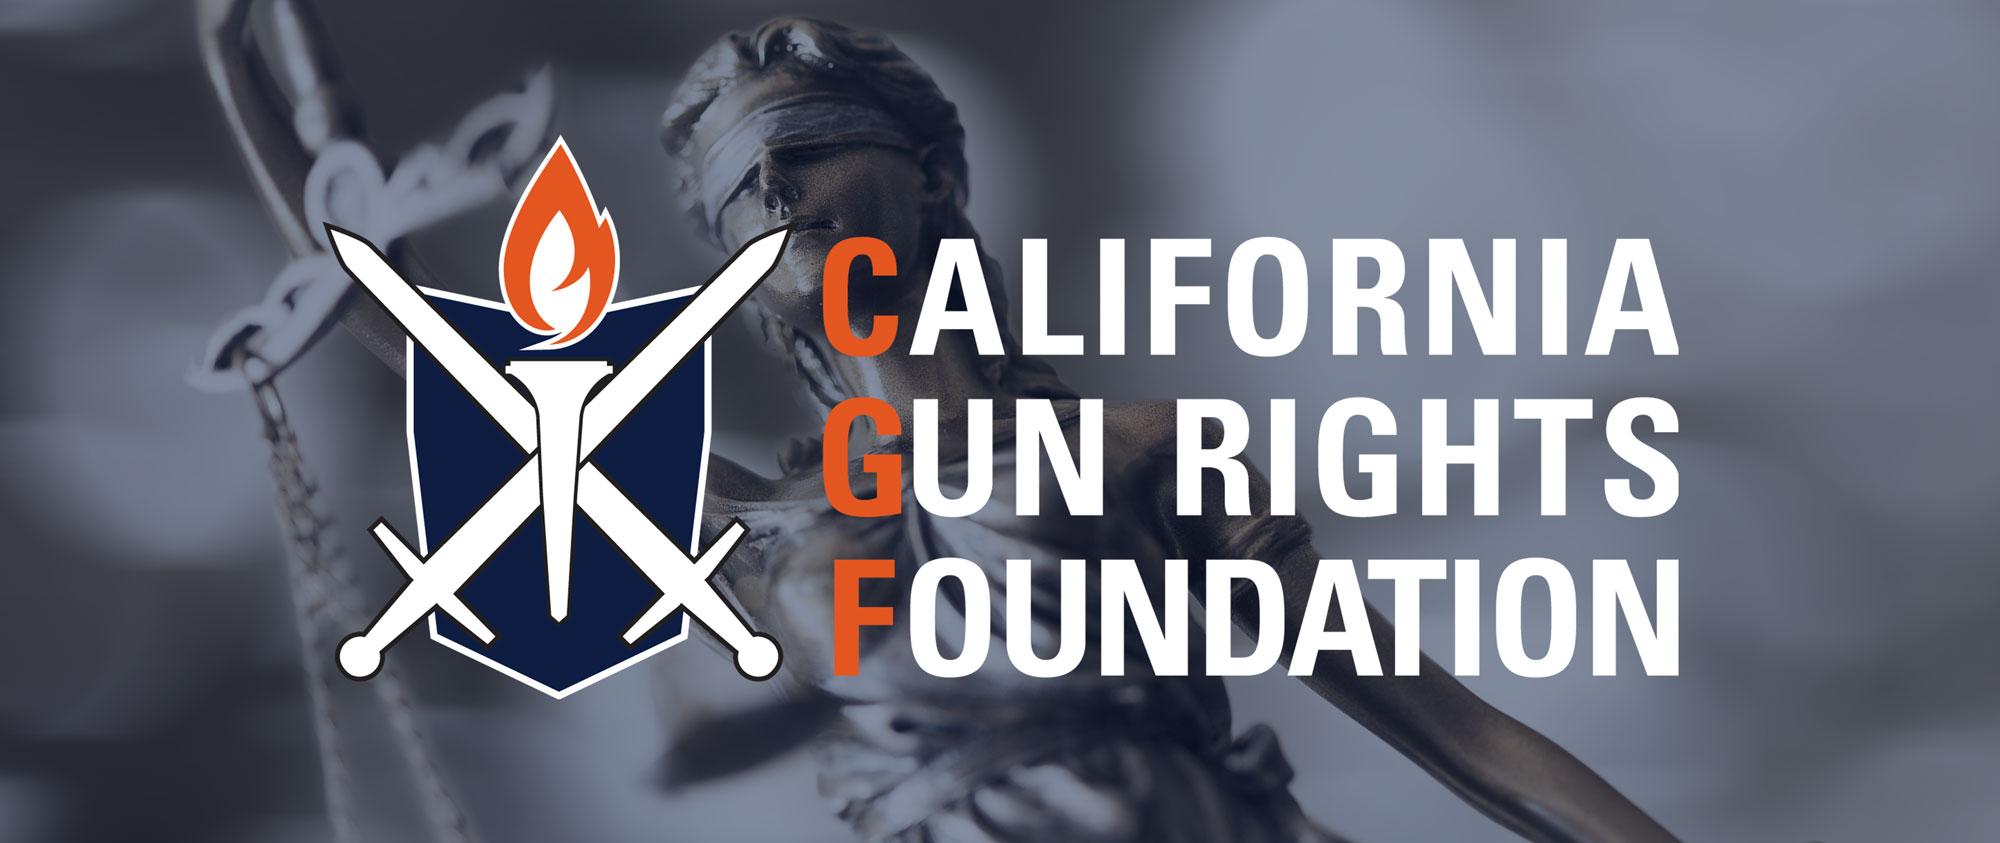 California Gun Rights Foundation